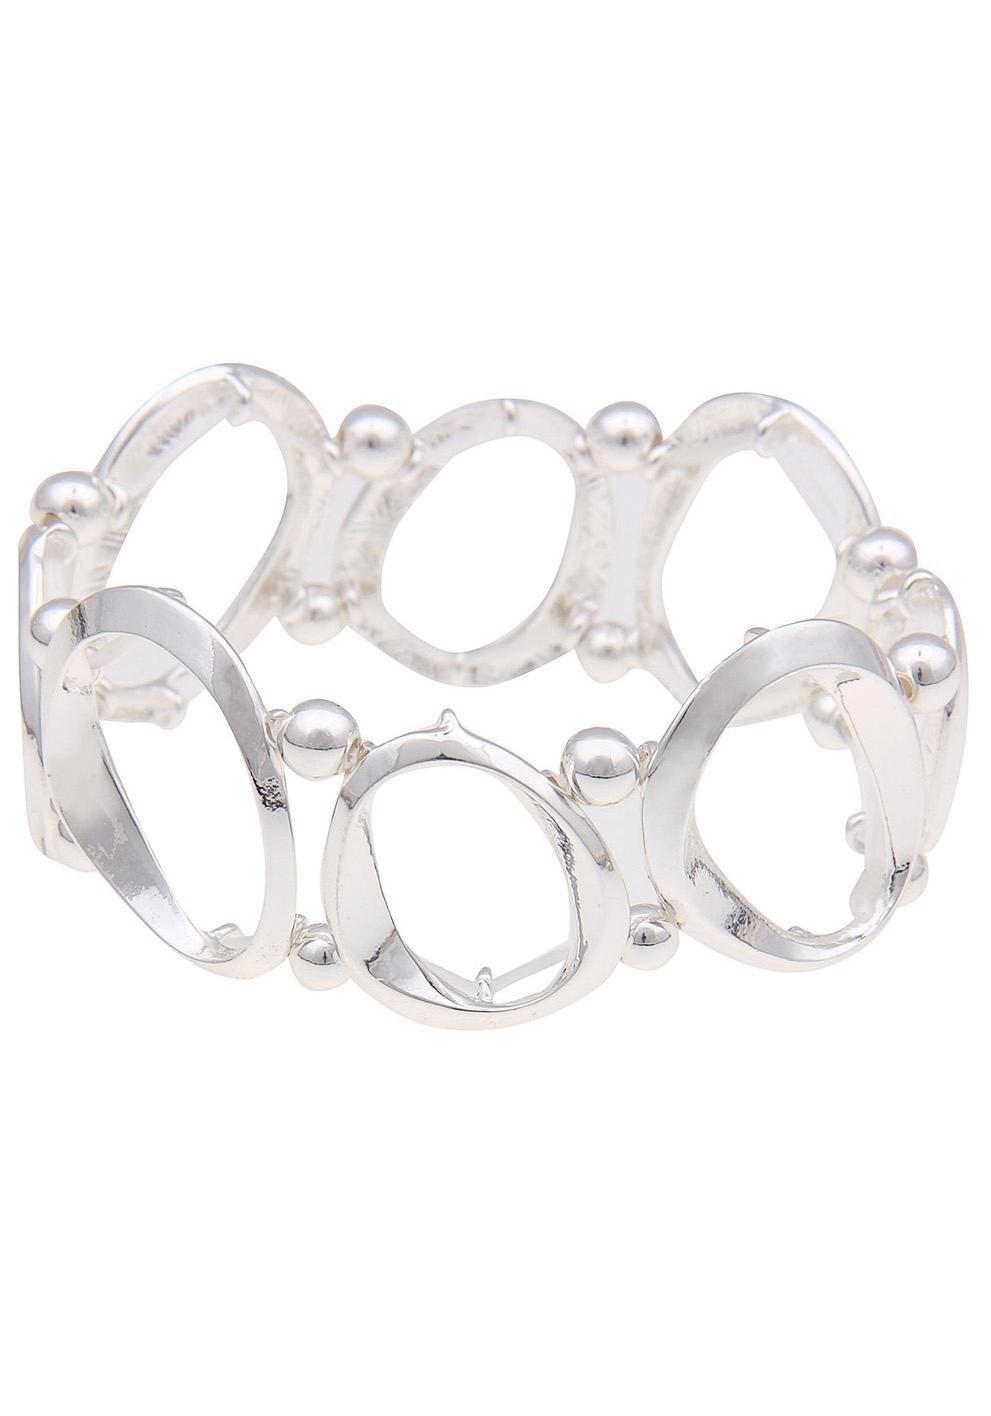 Leslii armband »Classy Shape, 260117326« online kopen op otto.nl